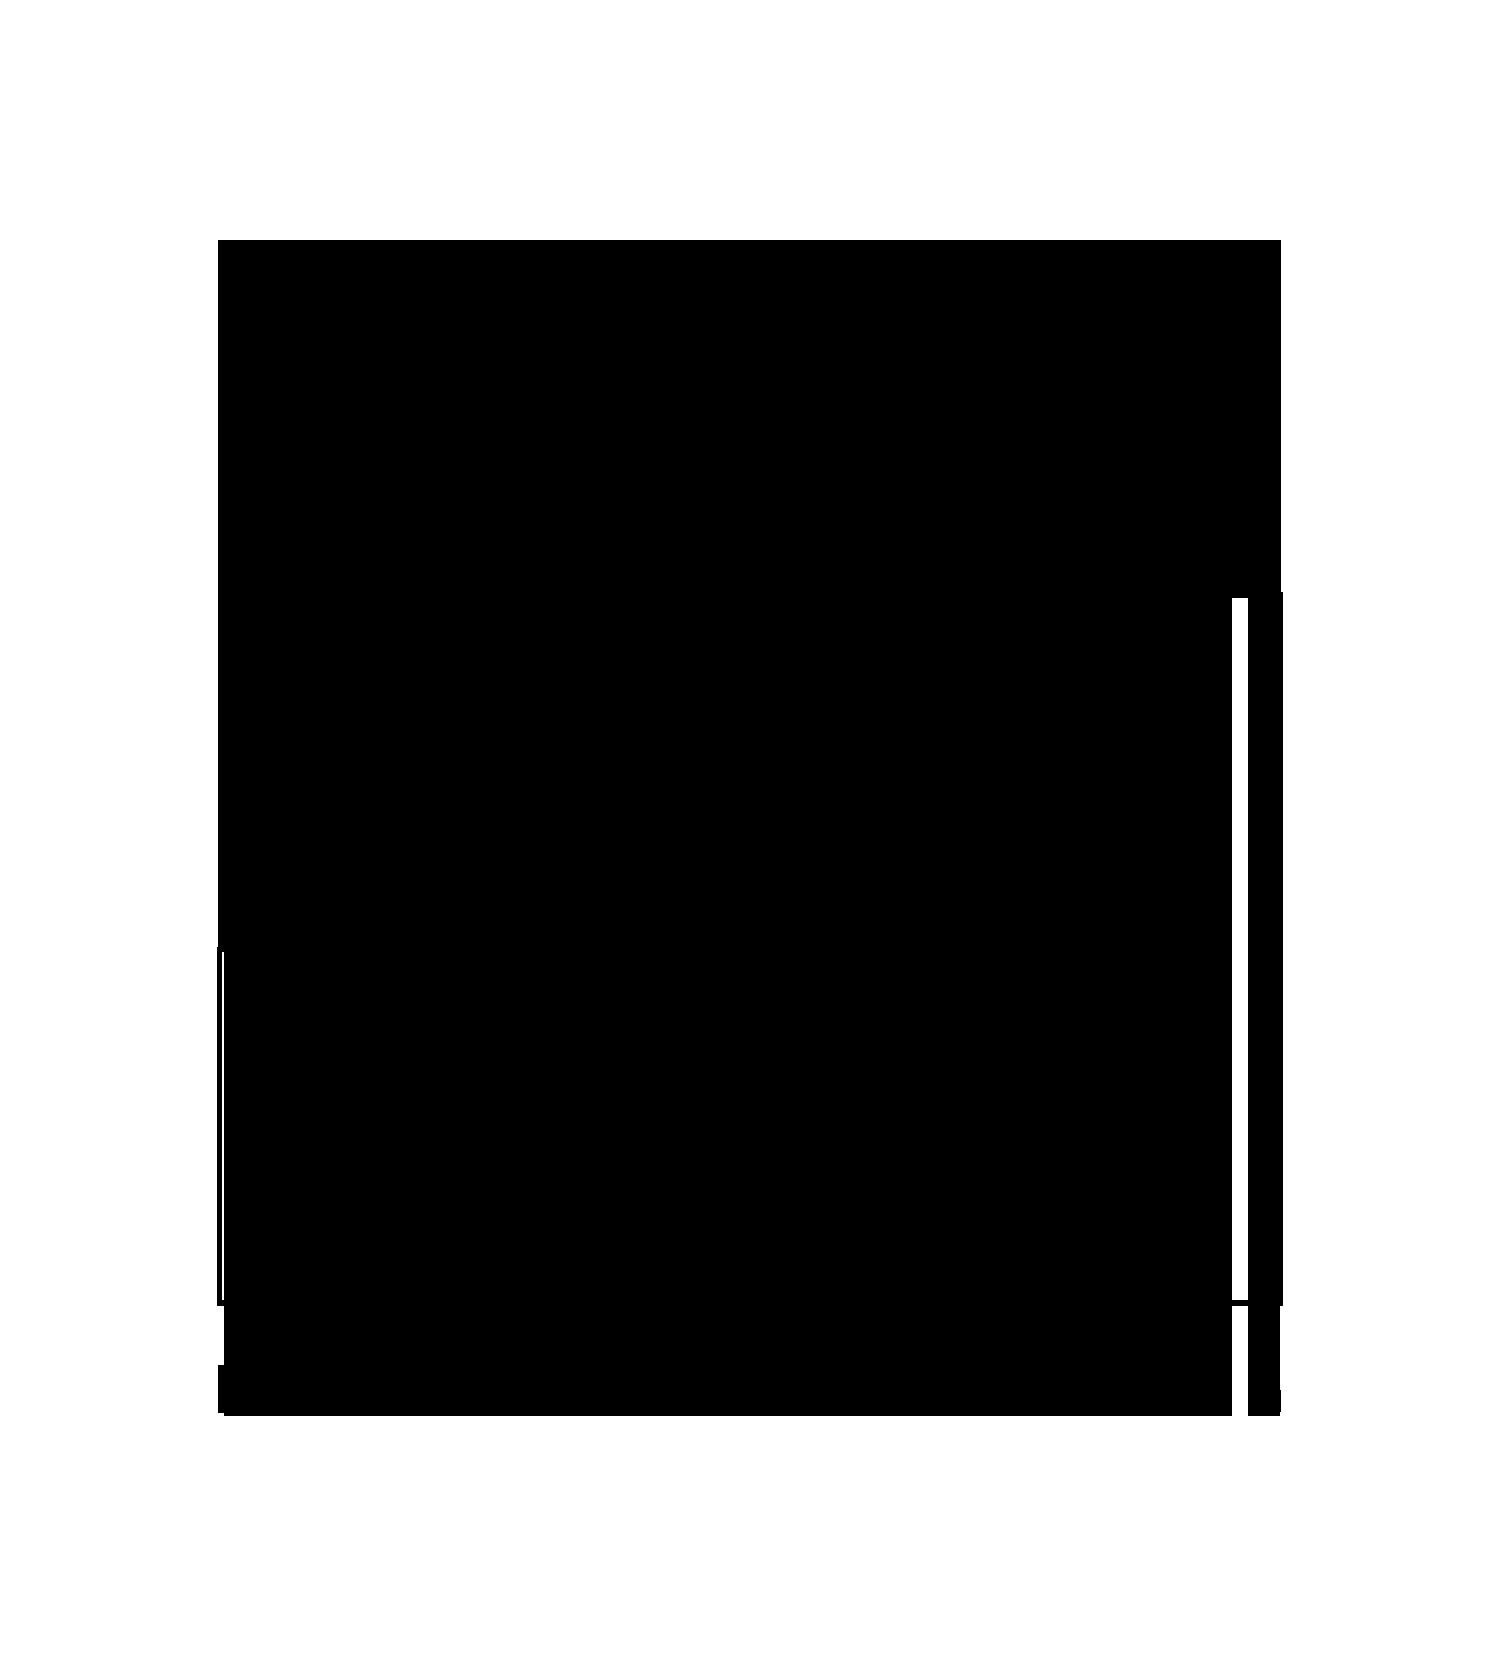 tetris-logo_black_new.png